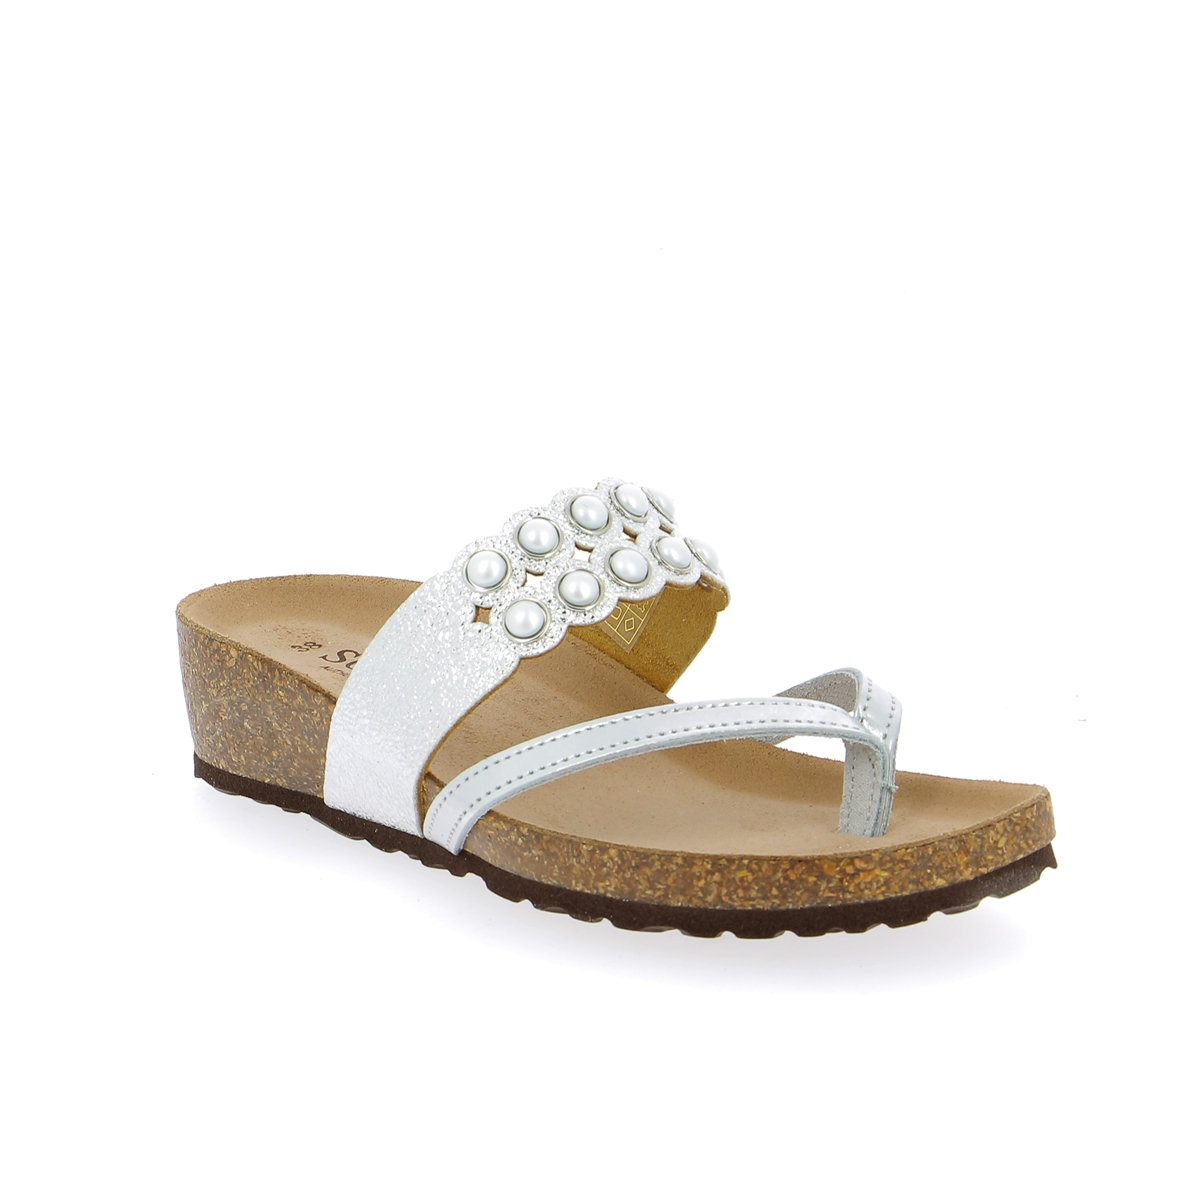 Scapa Muiltjes - slippers zilver